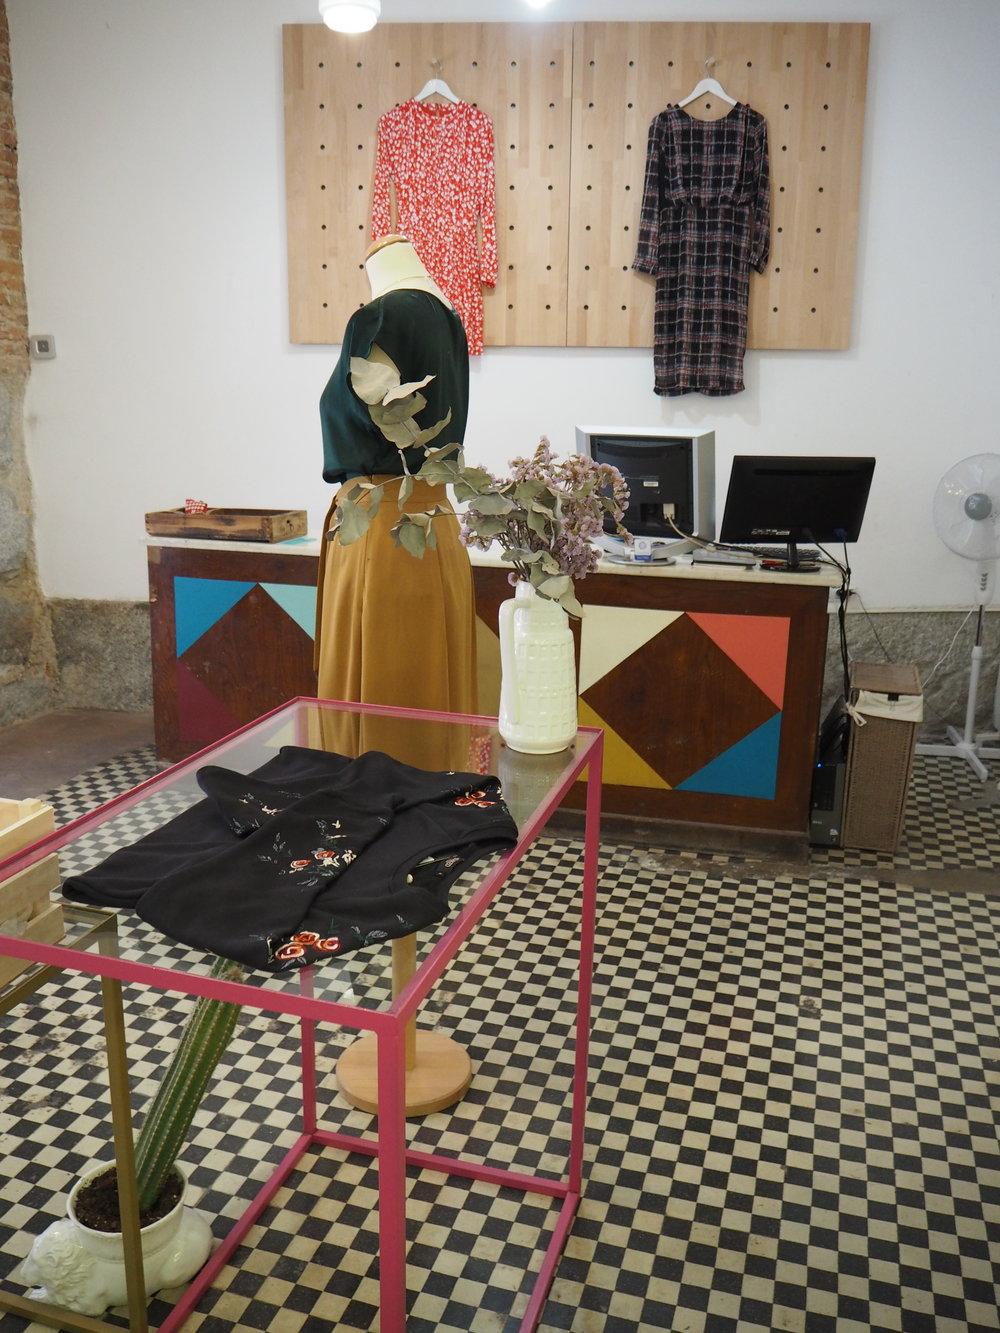 tiendas-ropa-madrid-originales-moda-lecircus.JPG